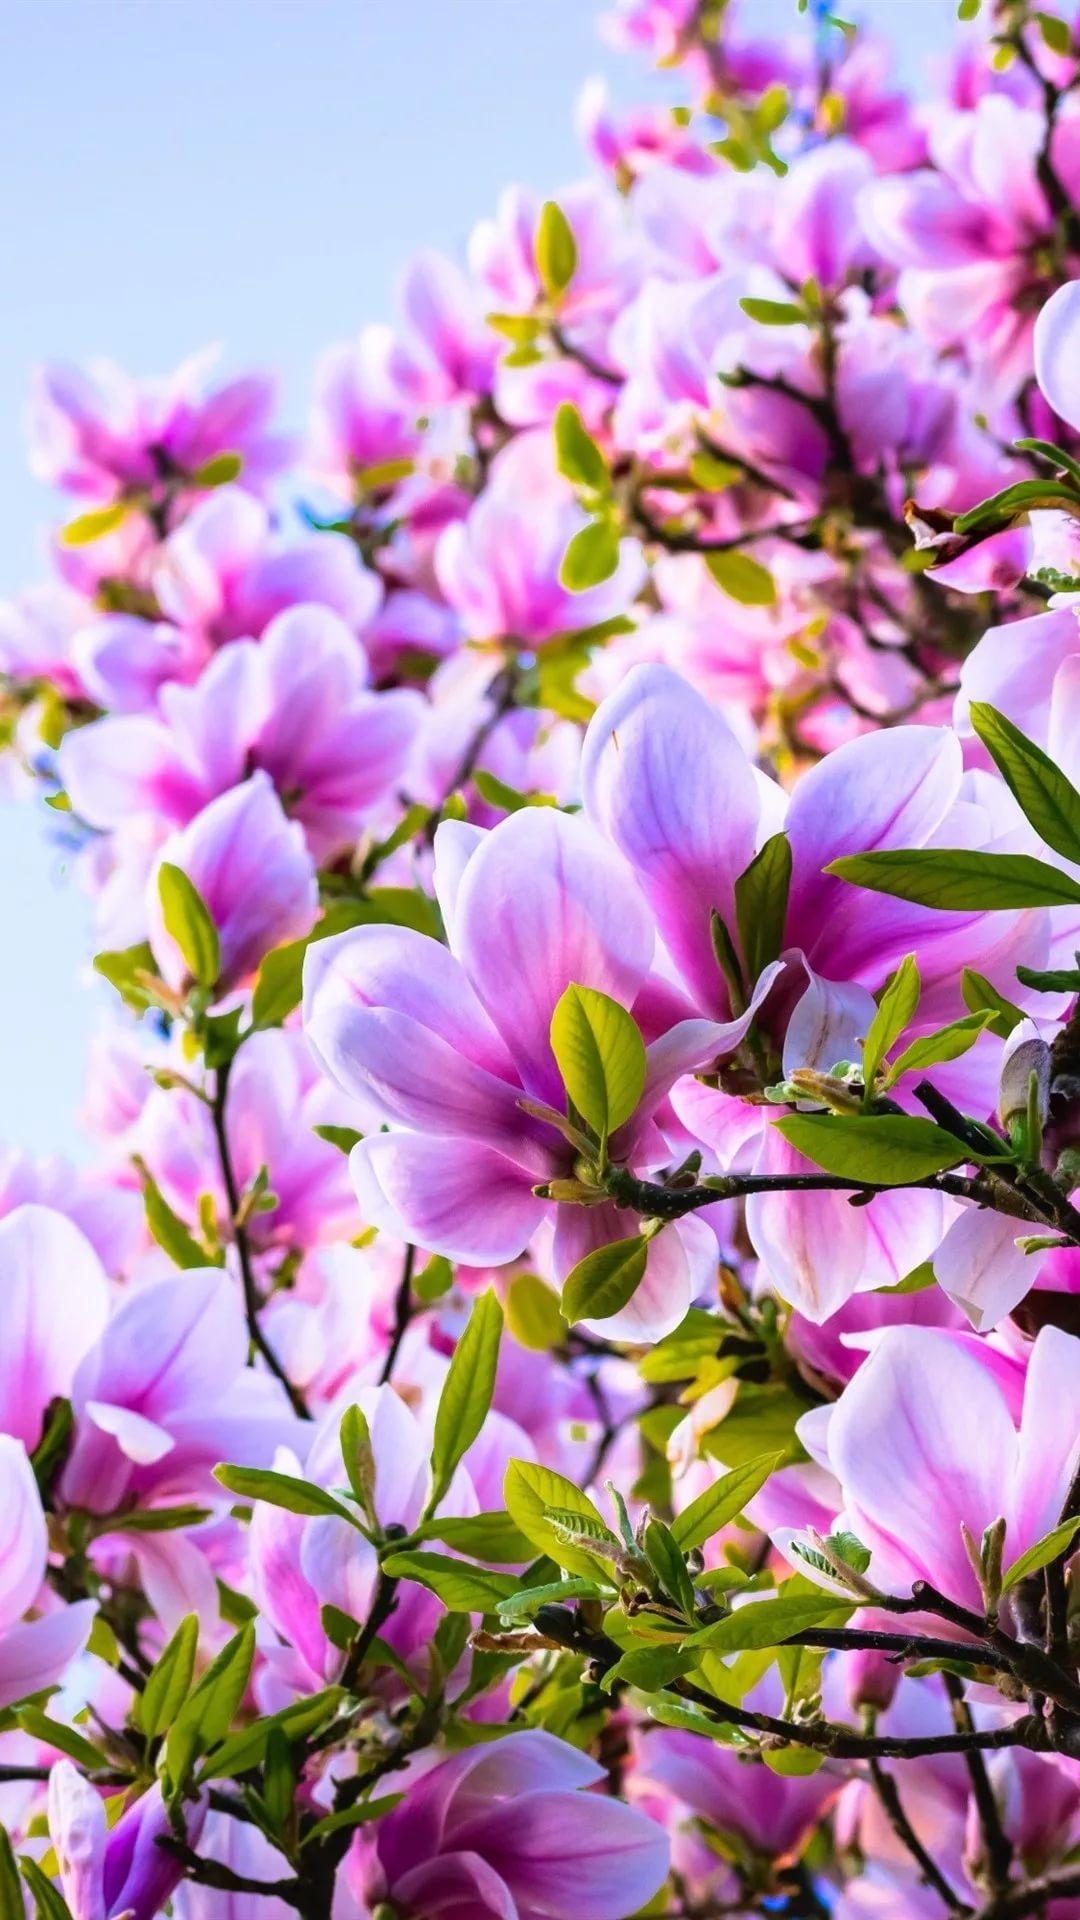 Красивые hd обои весна на телефон 2